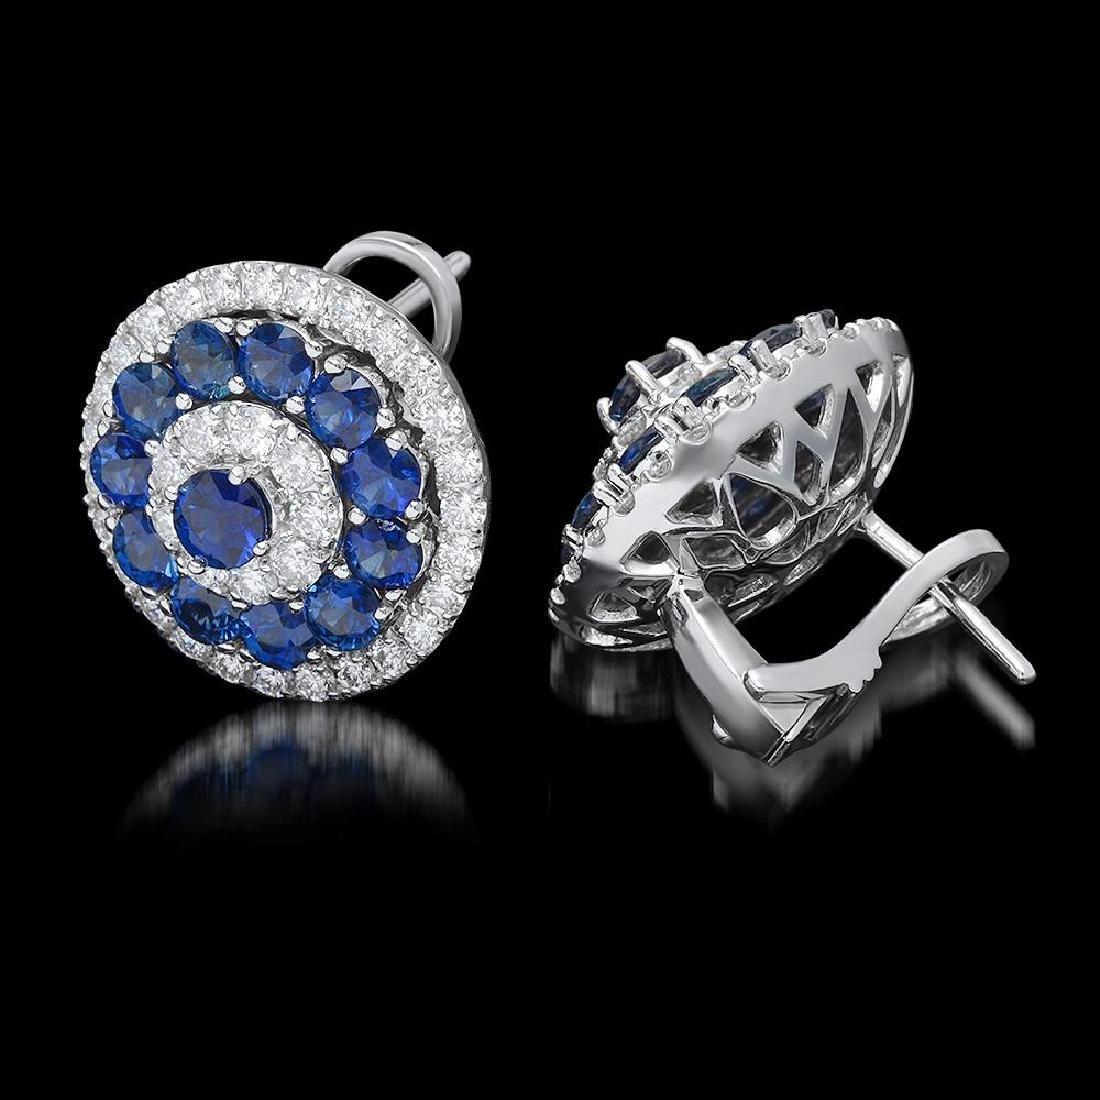 14k White Gold 4.63ct Sapphire 1.75ct Diamond Earrings - 2